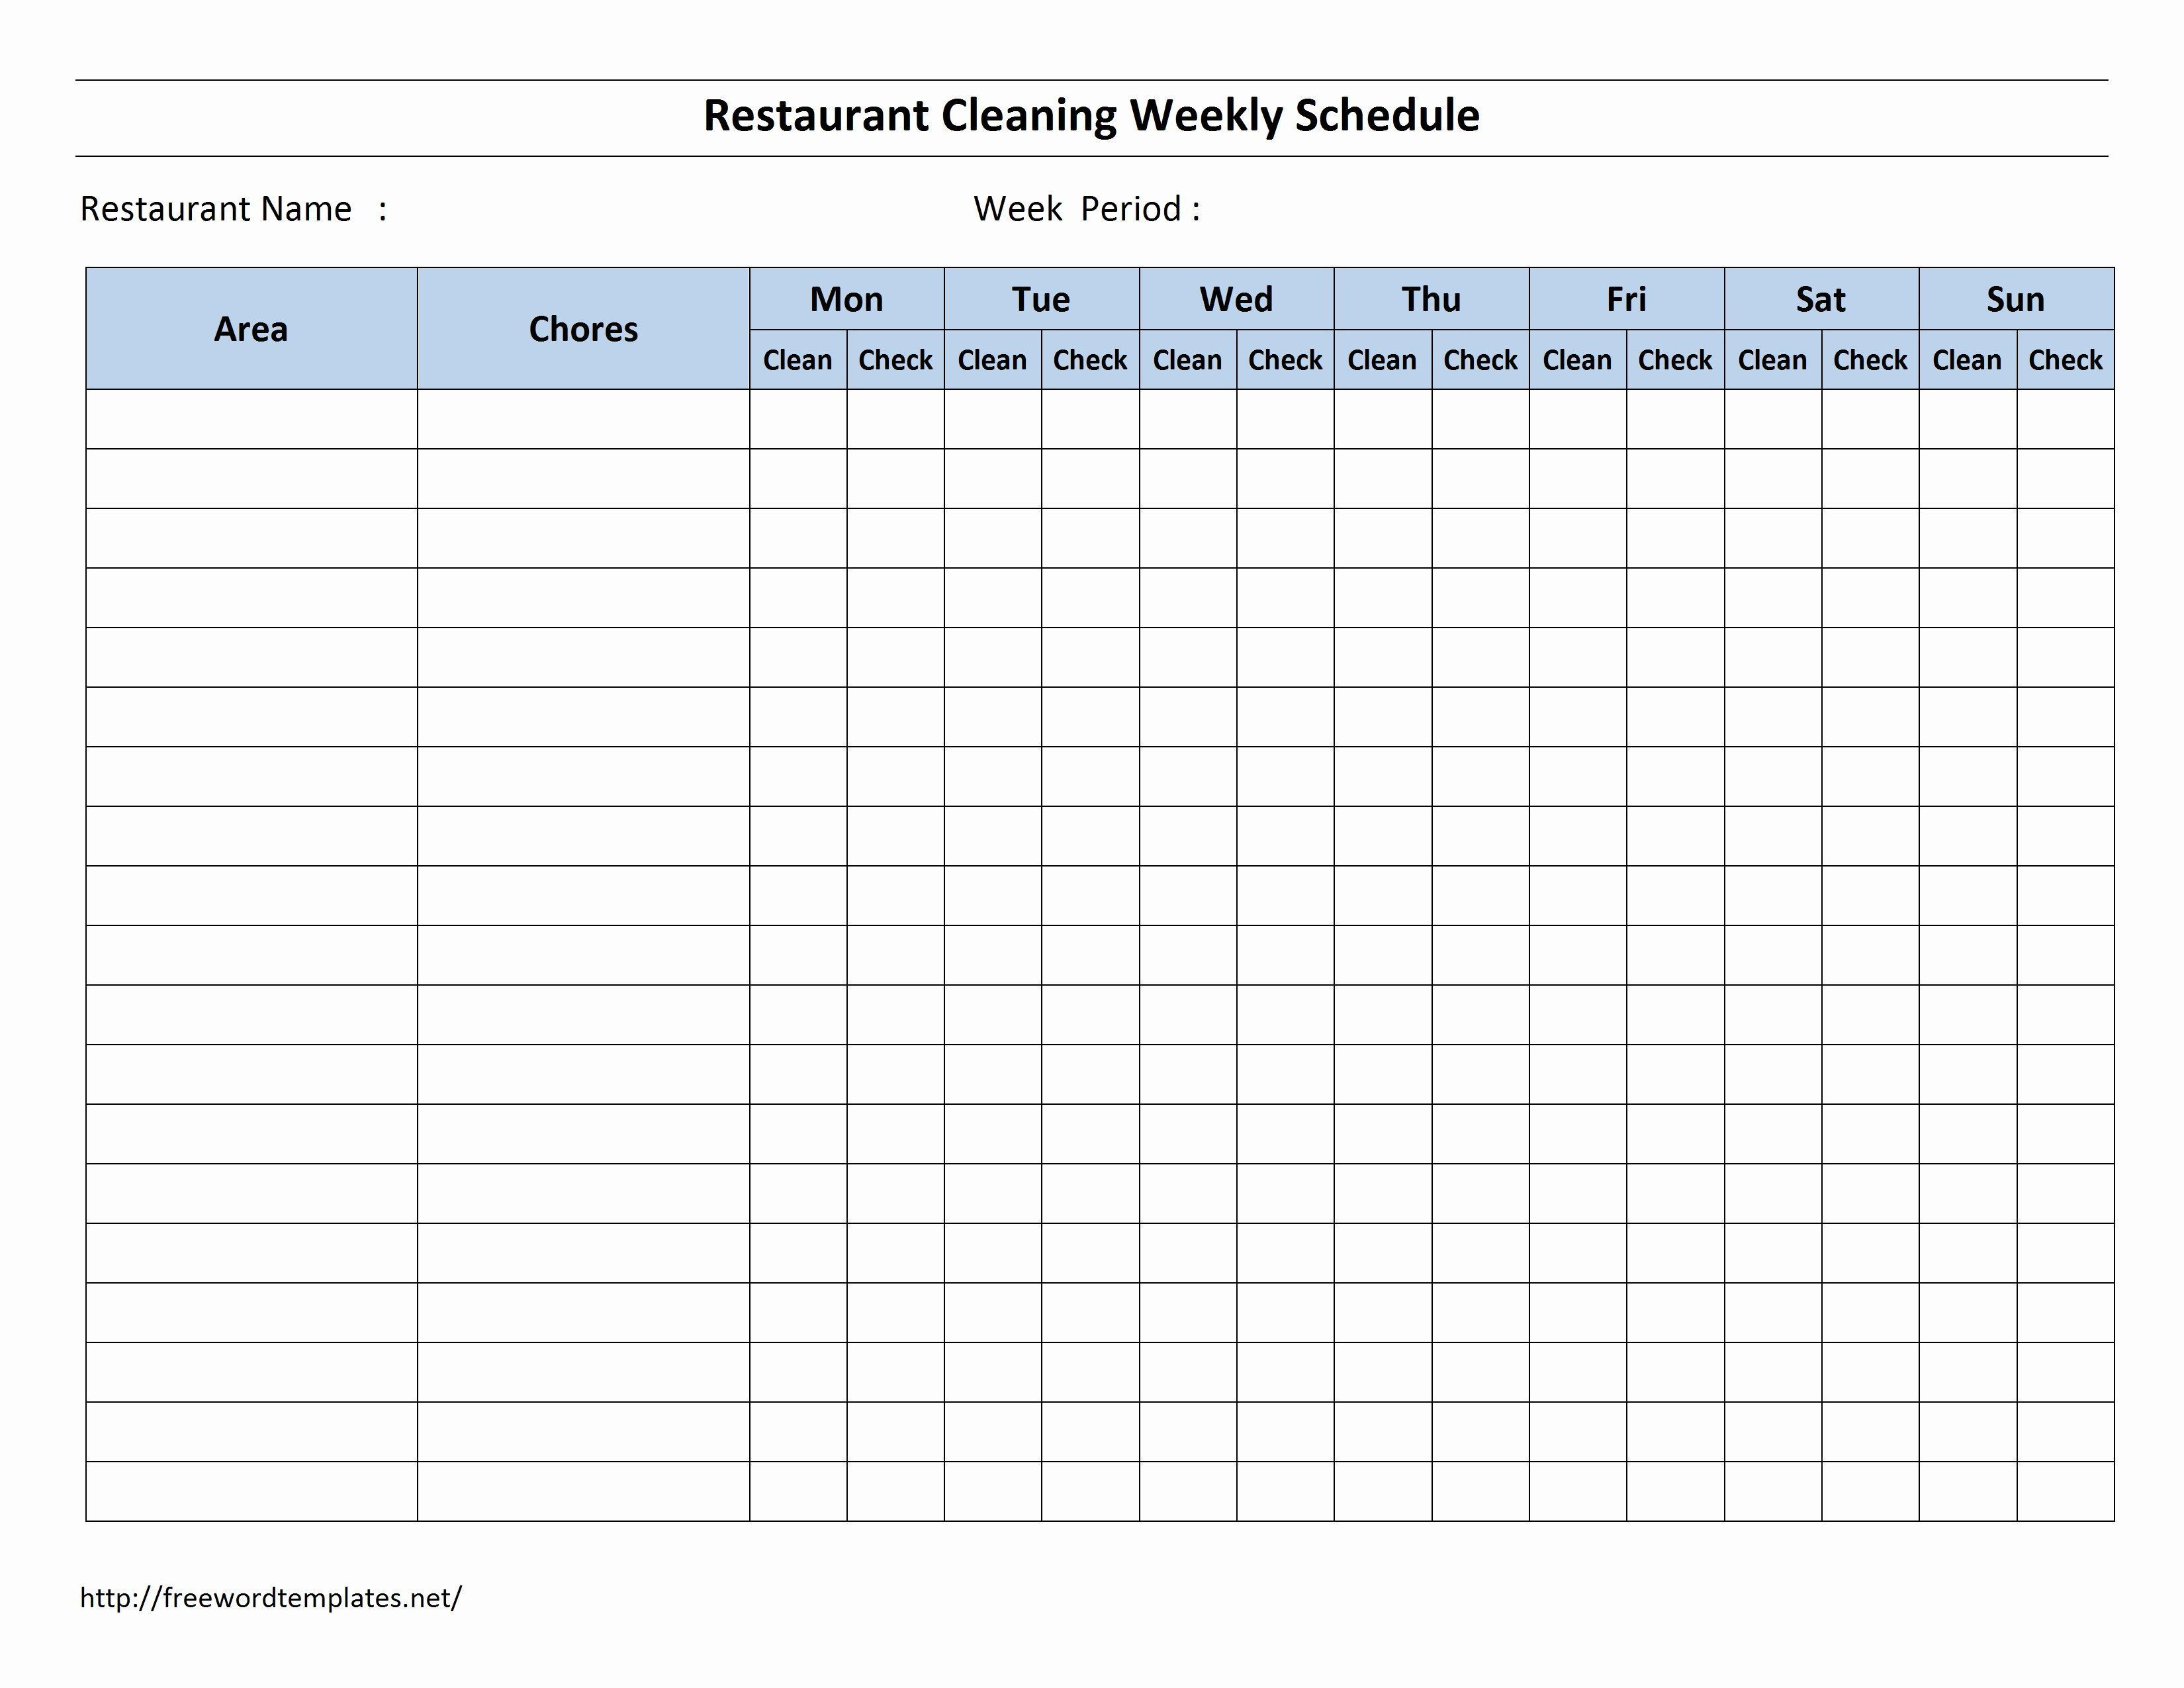 Bathroom Cleaning Schedule Template Best Of Restroom Log 3300 2550 Cleaning Schedule Templates In 2020 Cleaning Schedule Templates Cleaning Schedule Schedule Template